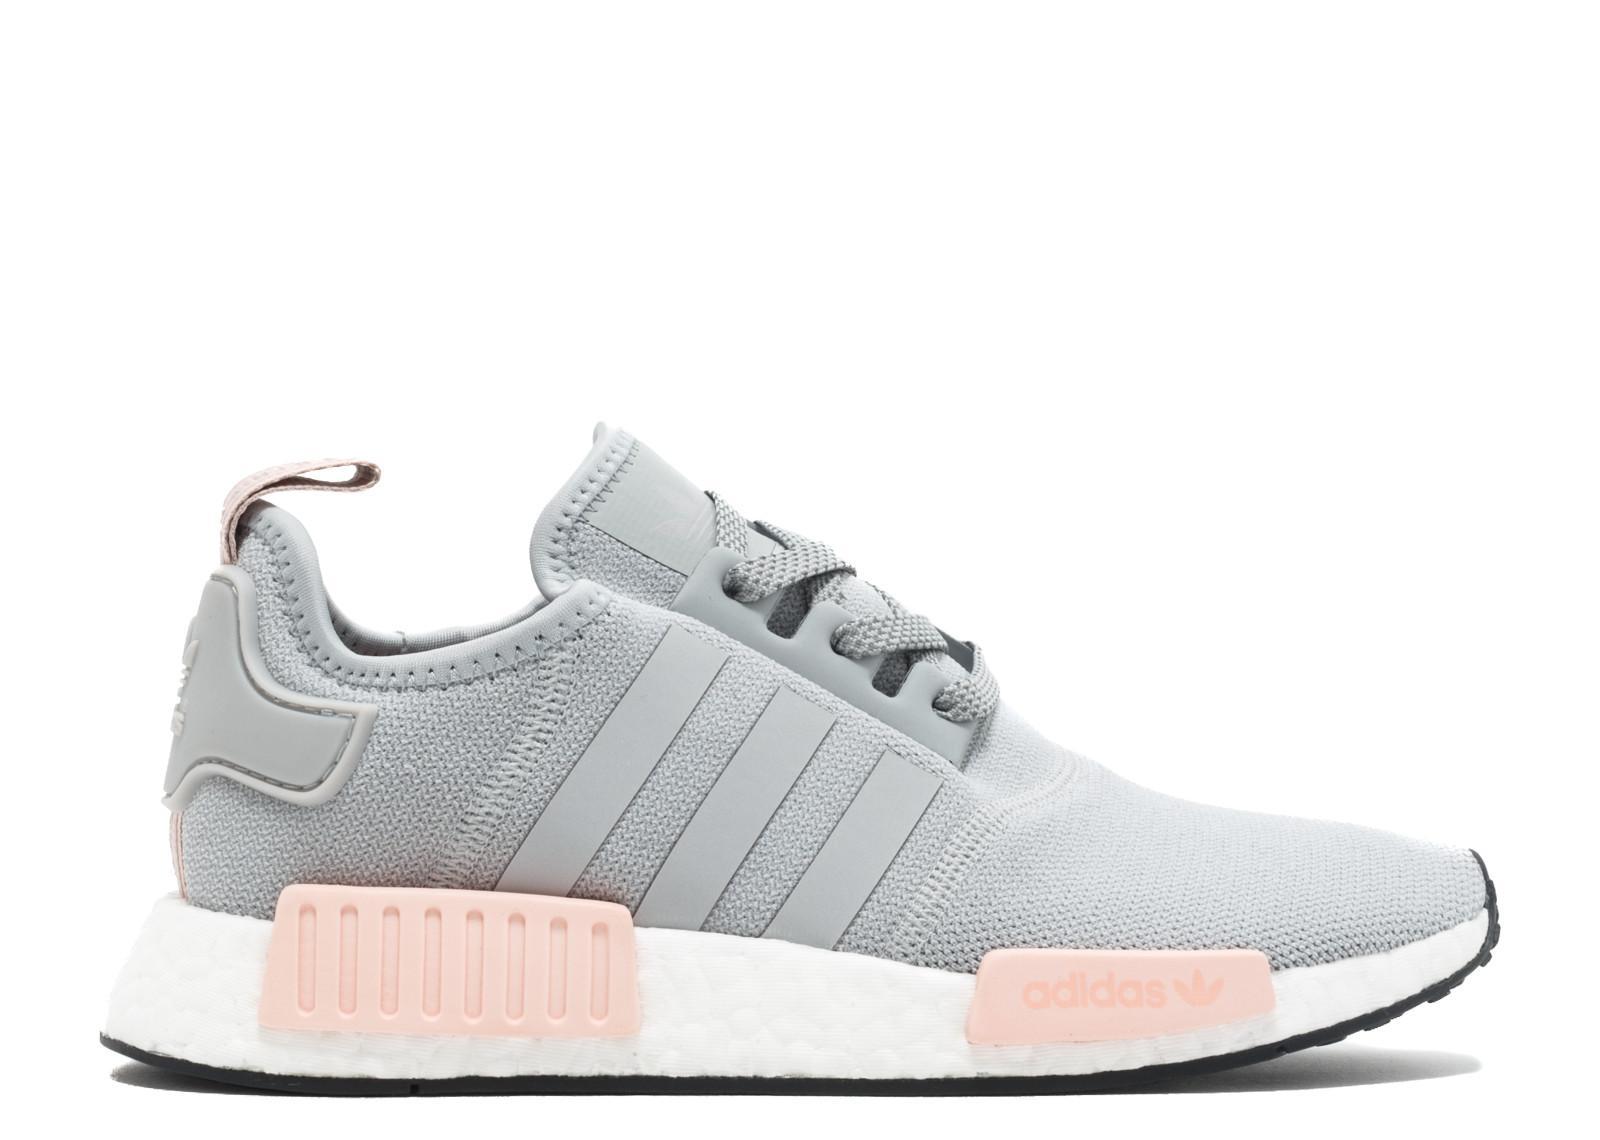 Adidas NMD R1 Grey Sepatu Sneakers Wanita - BY3058